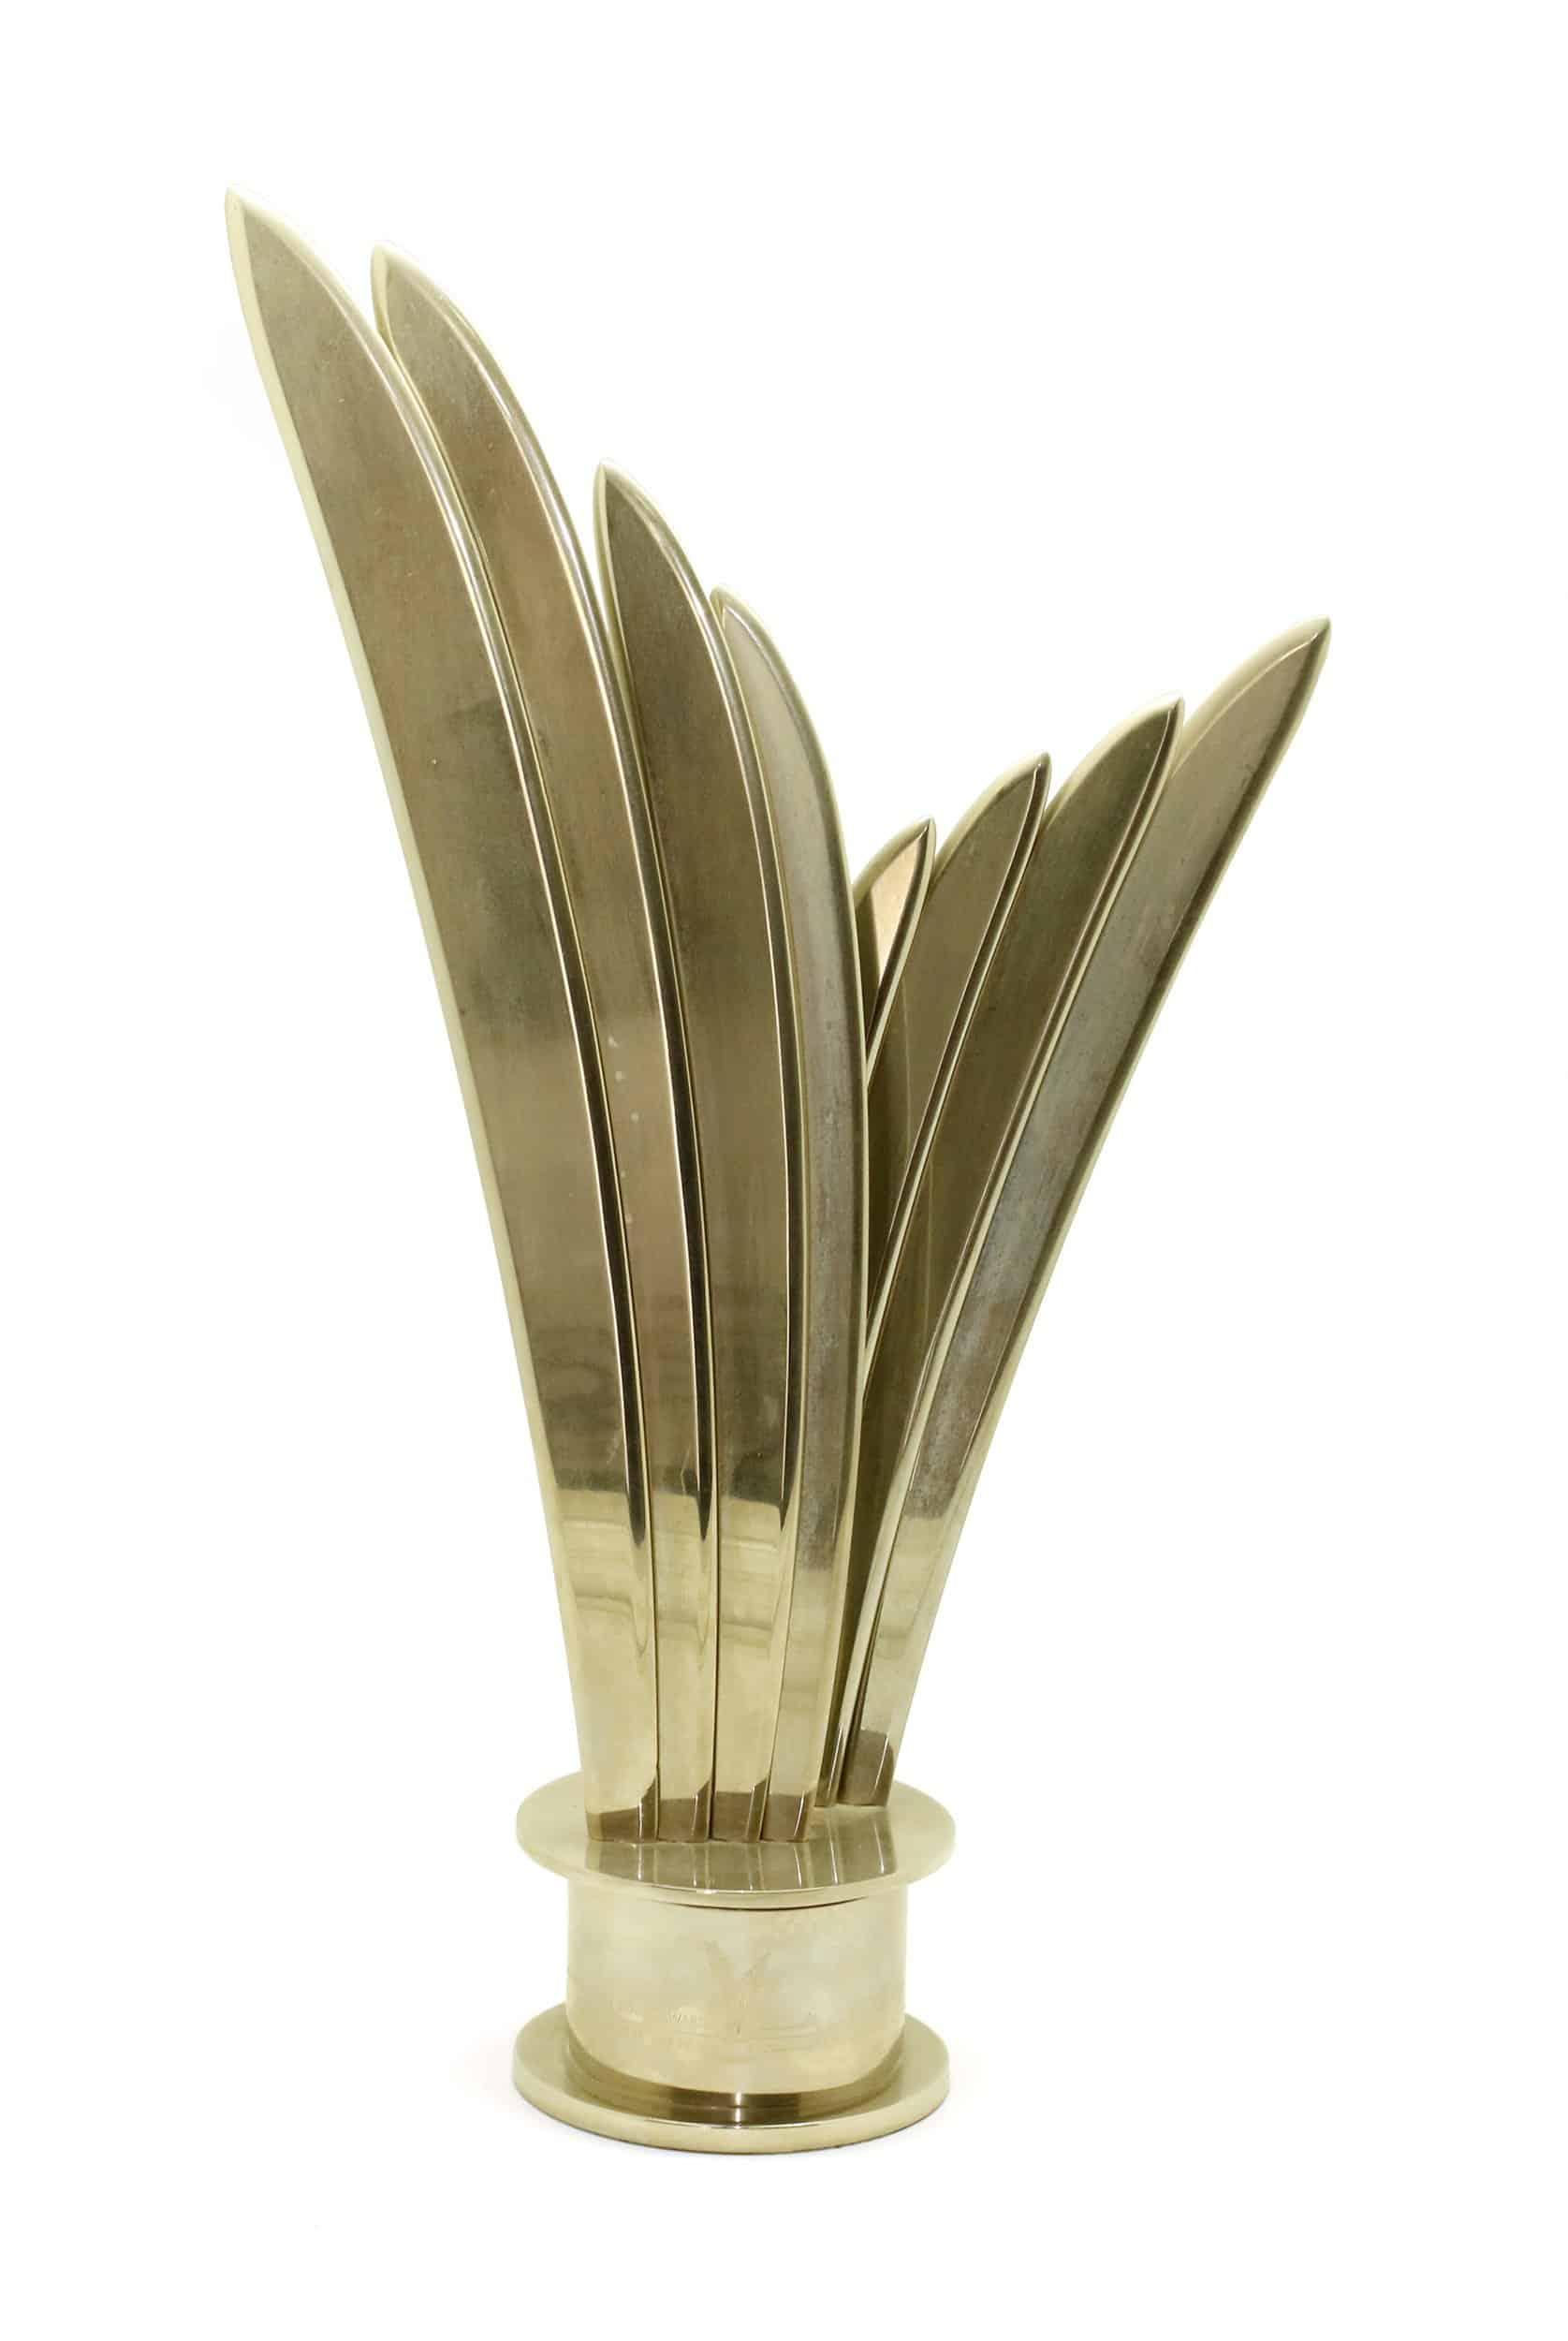 Sheikh Mohammed Bin Rashid Award for Youth Projects 2012